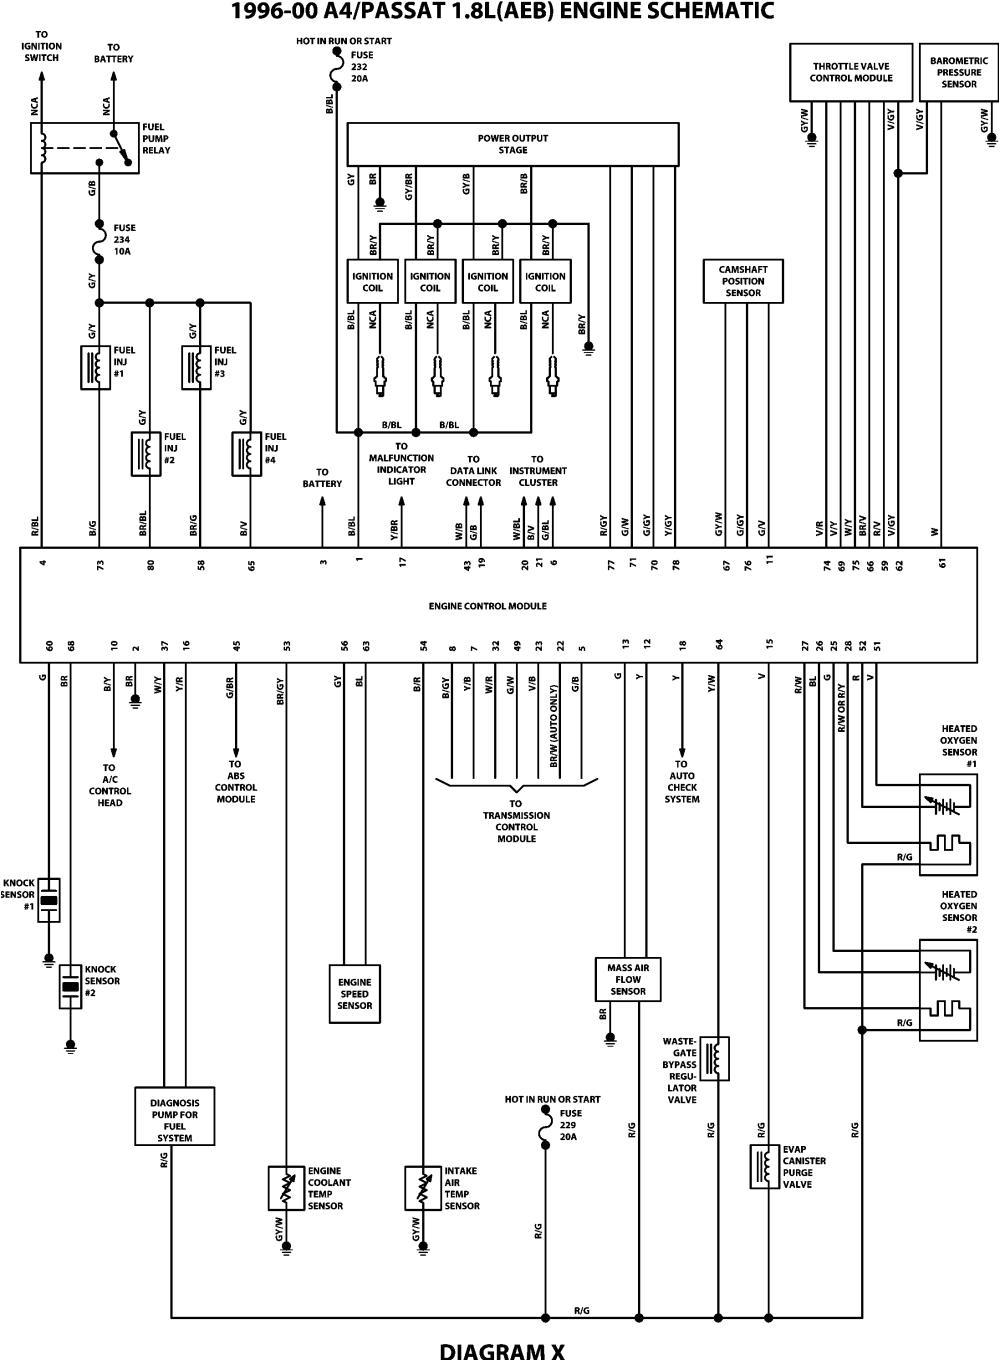 Passat Wiring Diagram Repair Guides Wiring Diagrams Wiring Diagrams Autozone Com